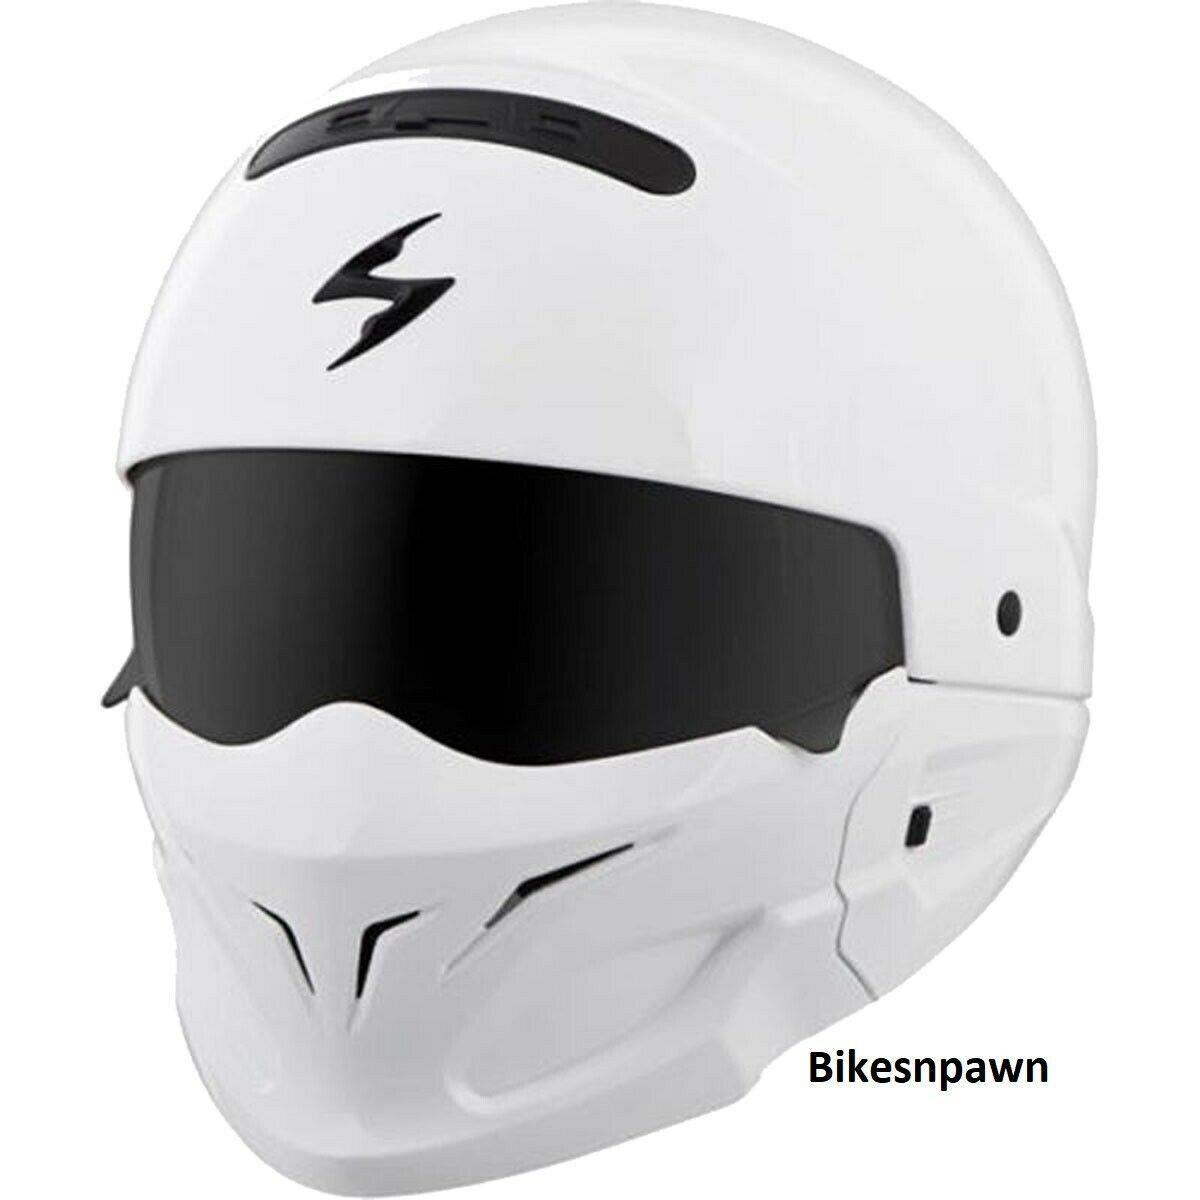 New Size 2XL Scorpion EXO Covert White 3 in 1 Motorcycle Helmet DOT